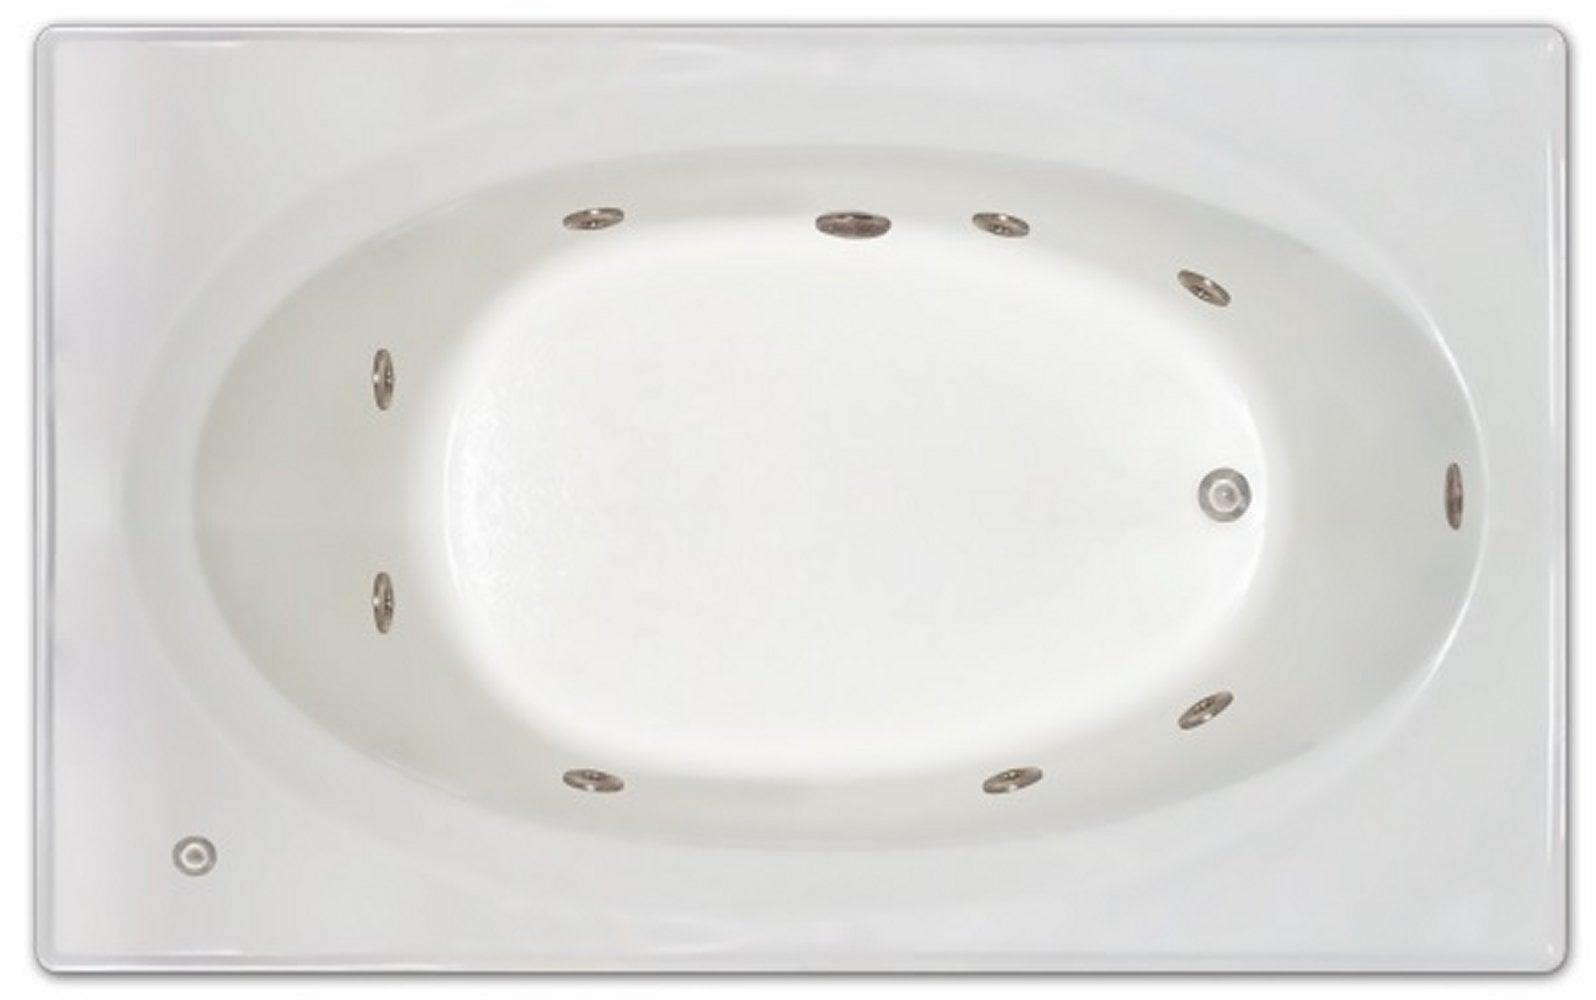 Drop-in Bathtub / 72x42x19 / high gloss white acrylic / Rectangle / LPI225-W-LD Pinnacle Bath - Whirlpool 0